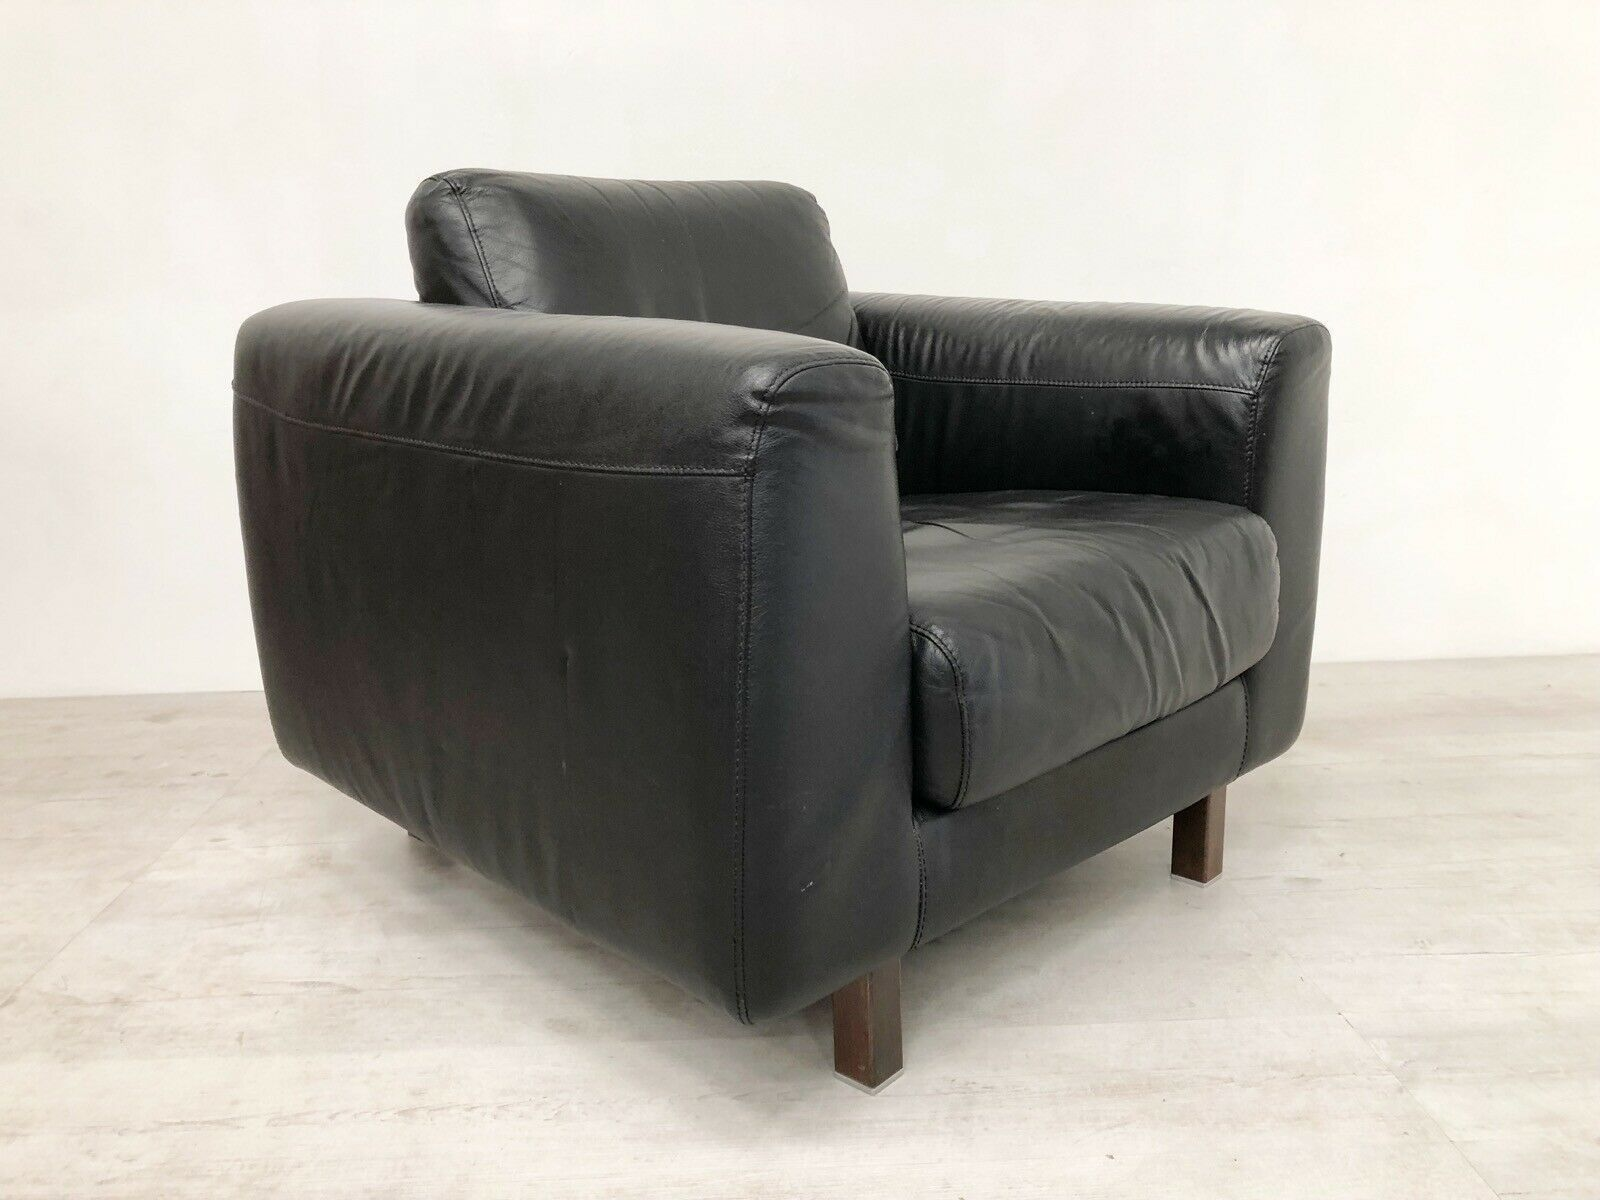 Groovy Vintage Habitat Escalus Black Leather Club Chair With Rosewood Legs Interior Design Ideas Gentotryabchikinfo